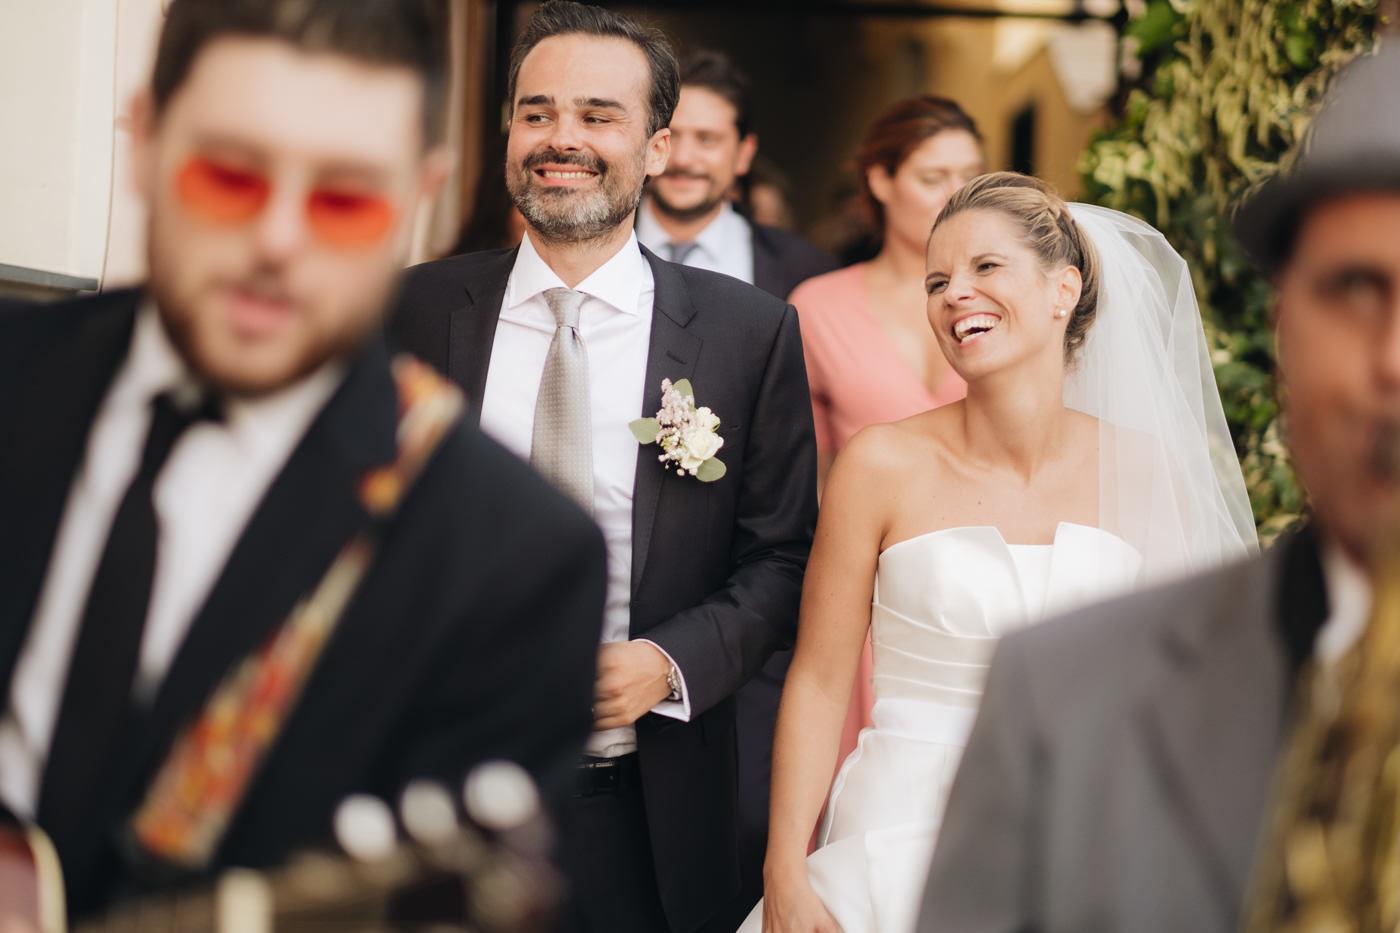 matrimoni_all_italiana_fotografo_matrimonio_cinque_terre-58.jpg